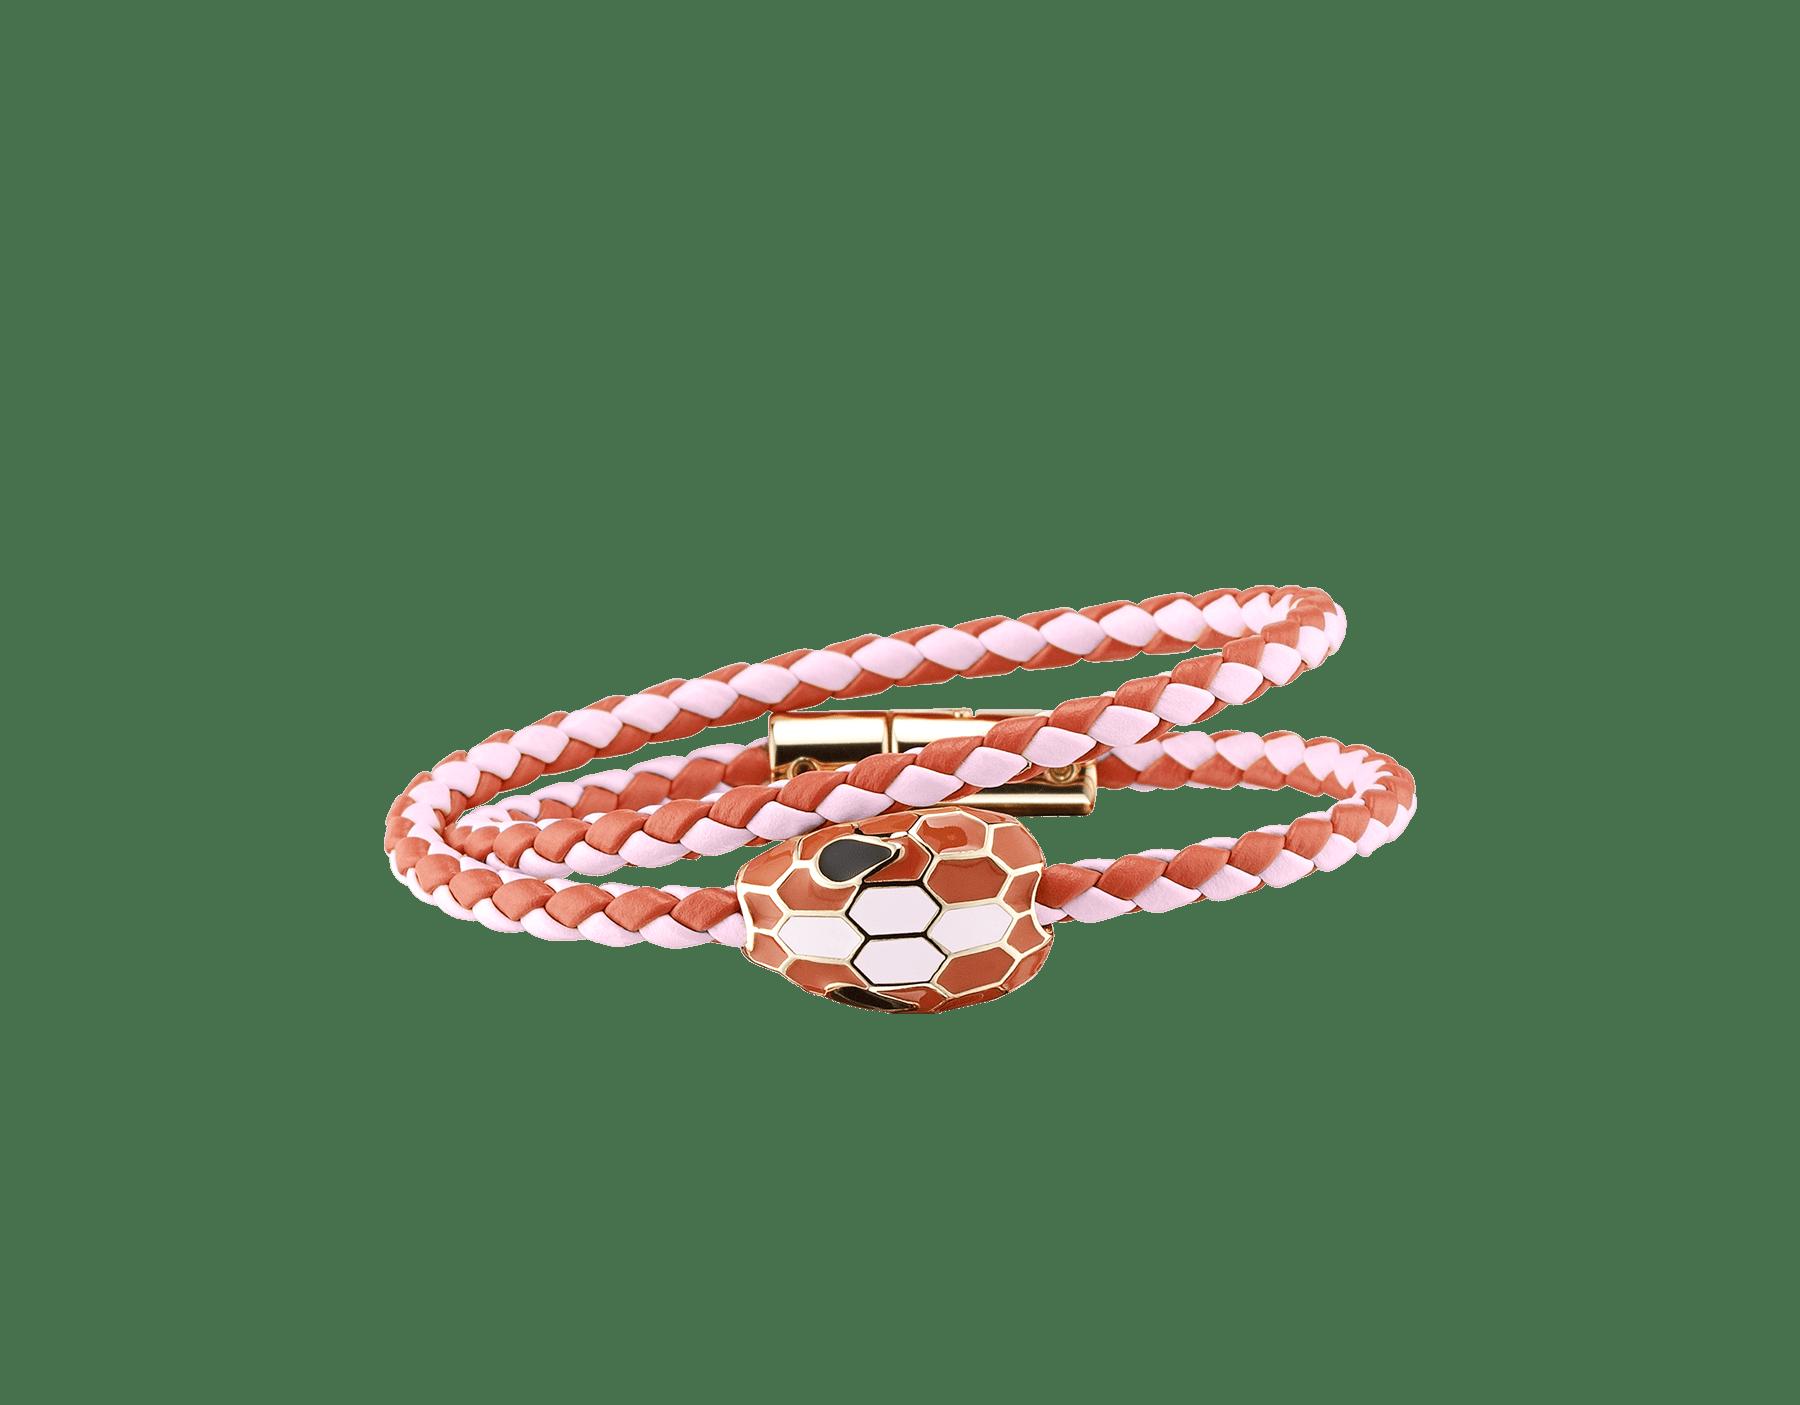 Serpenti Forever 多圈編穗手環,採用法國玫瑰色和帝王拓帕石色編織小牛皮,經典蛇頭元素飾以黑色和法國玫瑰色琺瑯。 SerpDoubleBraid-WCL-RdFIT image 1